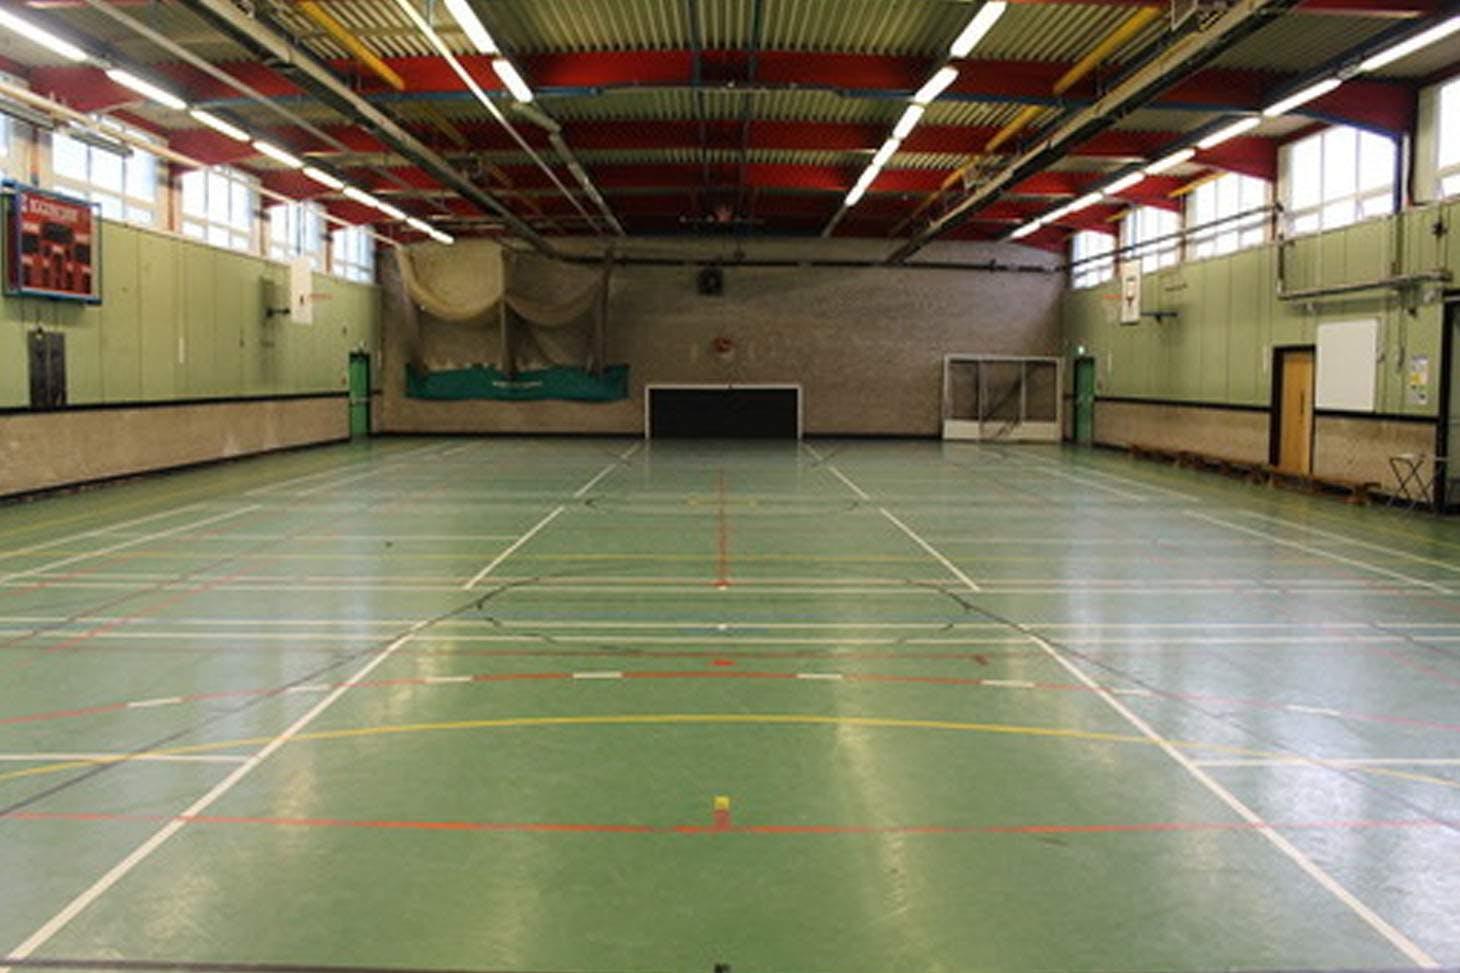 Egglescliffe School Nets | Sports hall cricket facilities